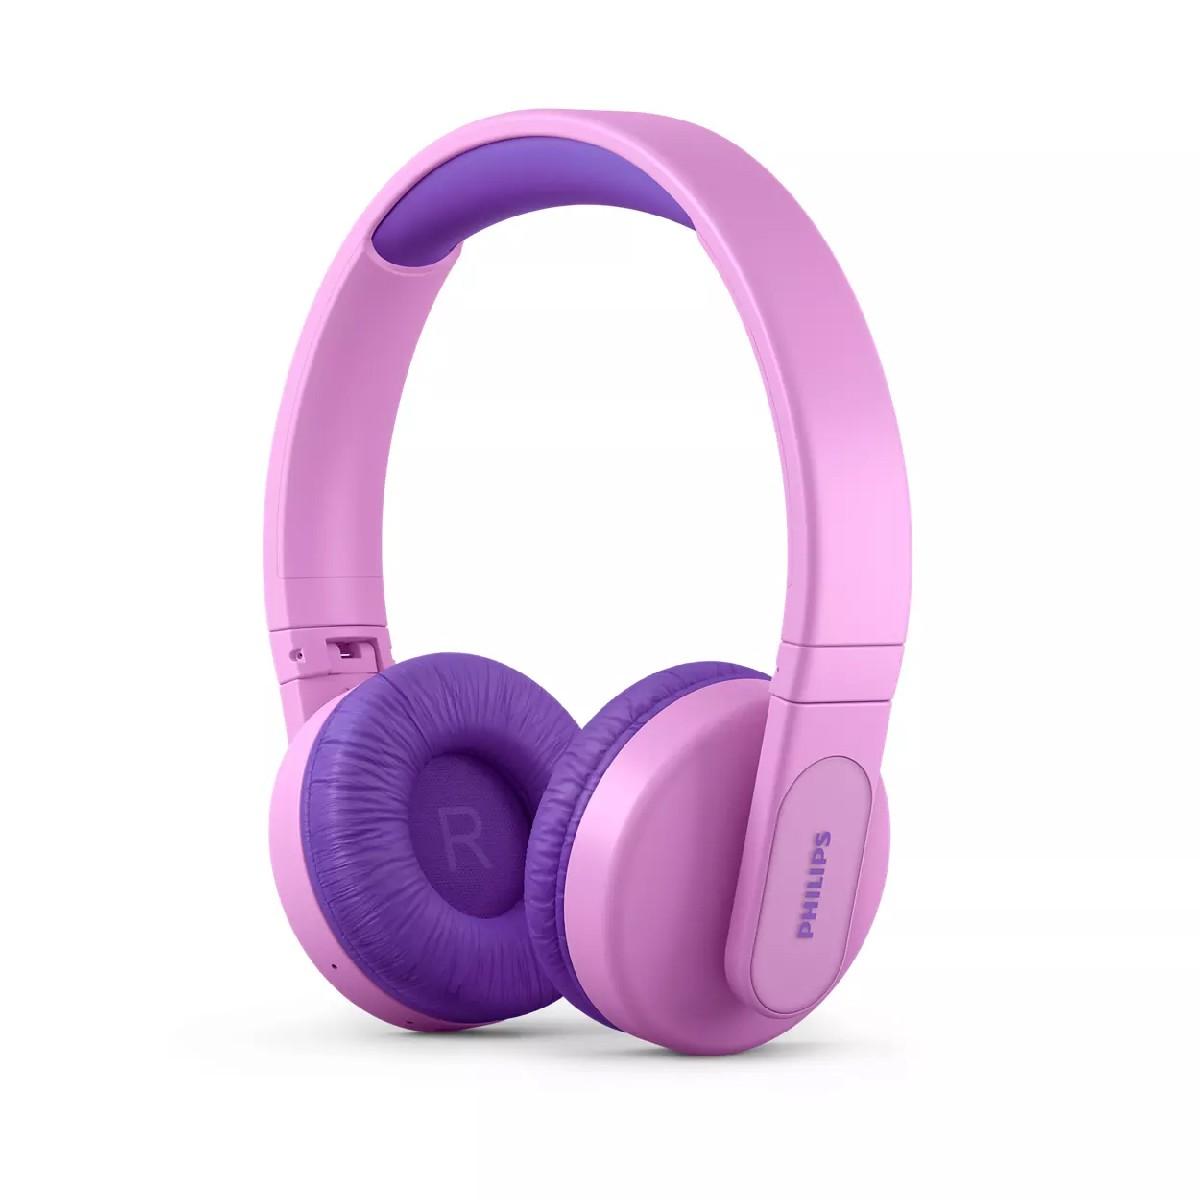 Bluetooth Ακουστικά Stereo Philips KidsTAK4206PK/00 V5.0 Ροζ On-ear με Μικρόφωνο, Φωτισμό, Πλήκτρα Ελέγχου και Εφαρμογή Γονικού Ελέγχου